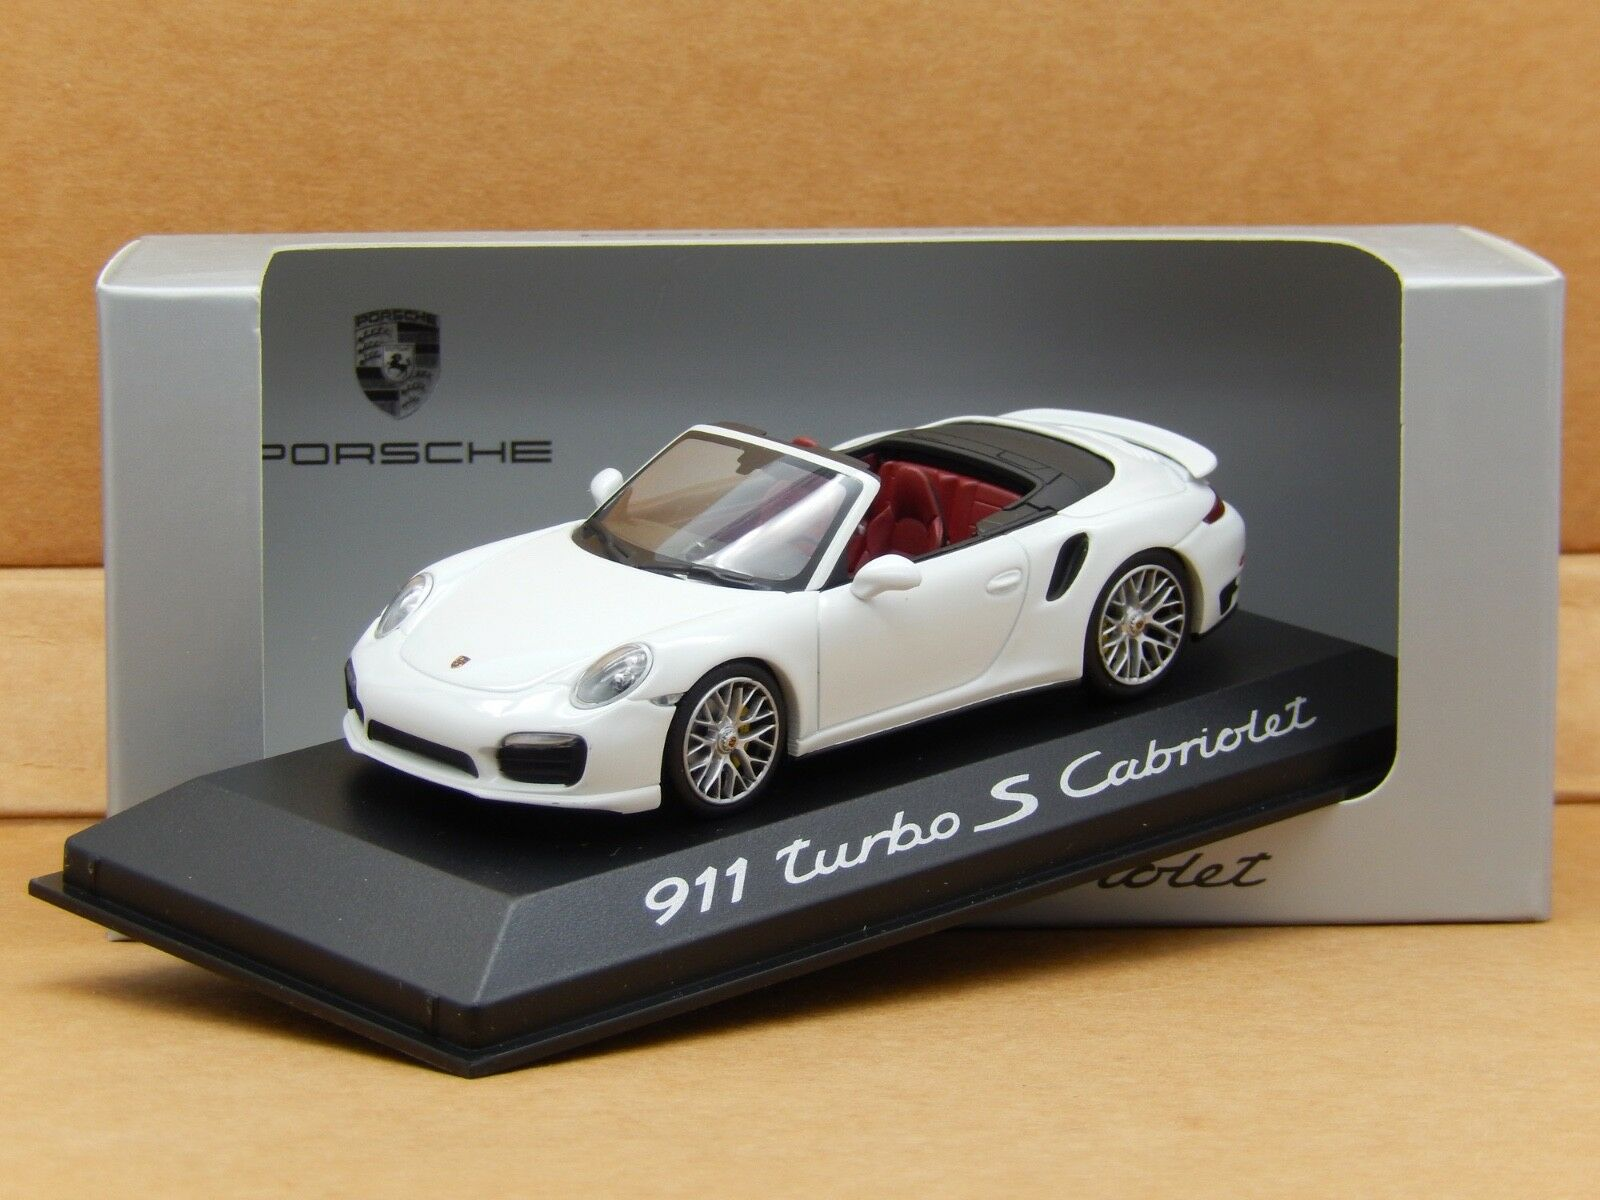 PORSCHE 911 Turbo S Cabriolet Bianco Typ 991 Minichamps modello WAP 020 311 0E